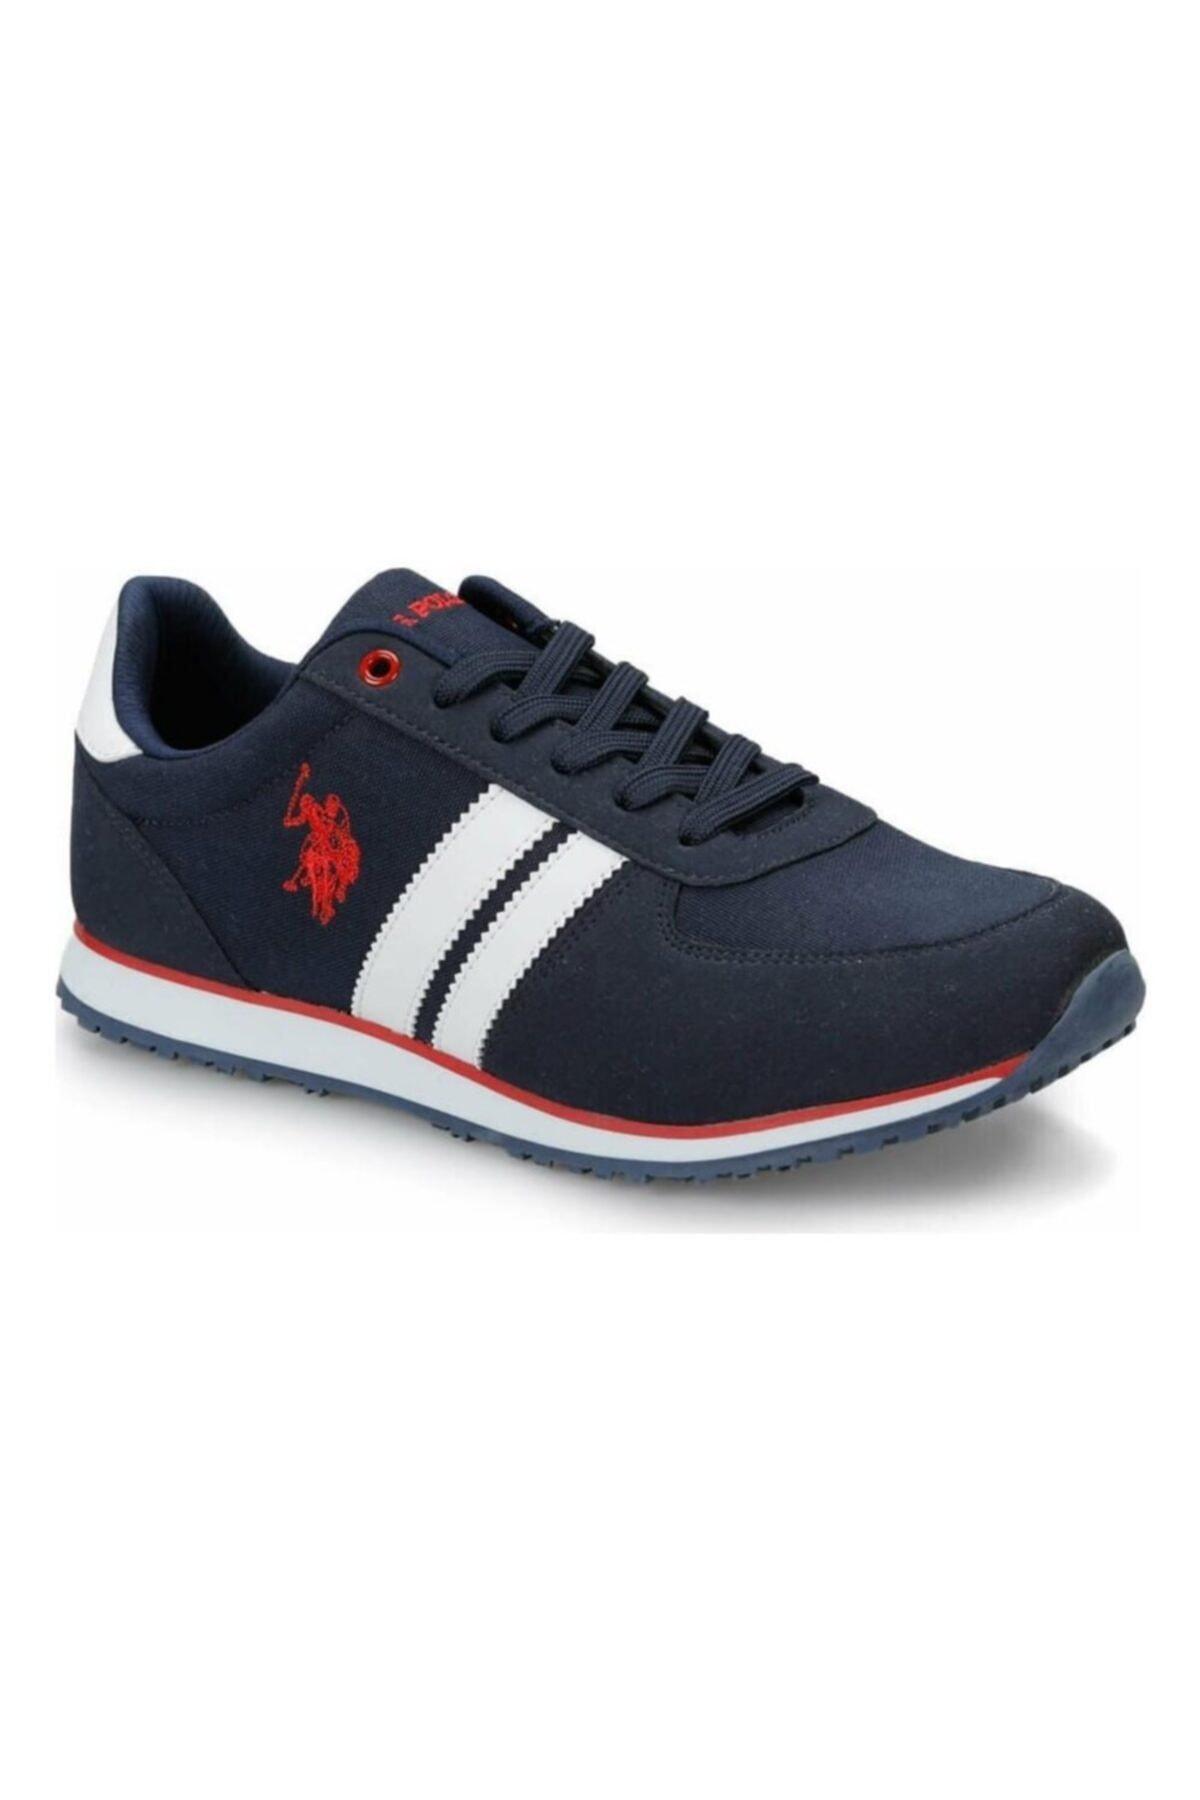 U.S. Polo Assn. PLUS 1FX Lacivert Erkek Sneaker Ayakkabı 100910647 1